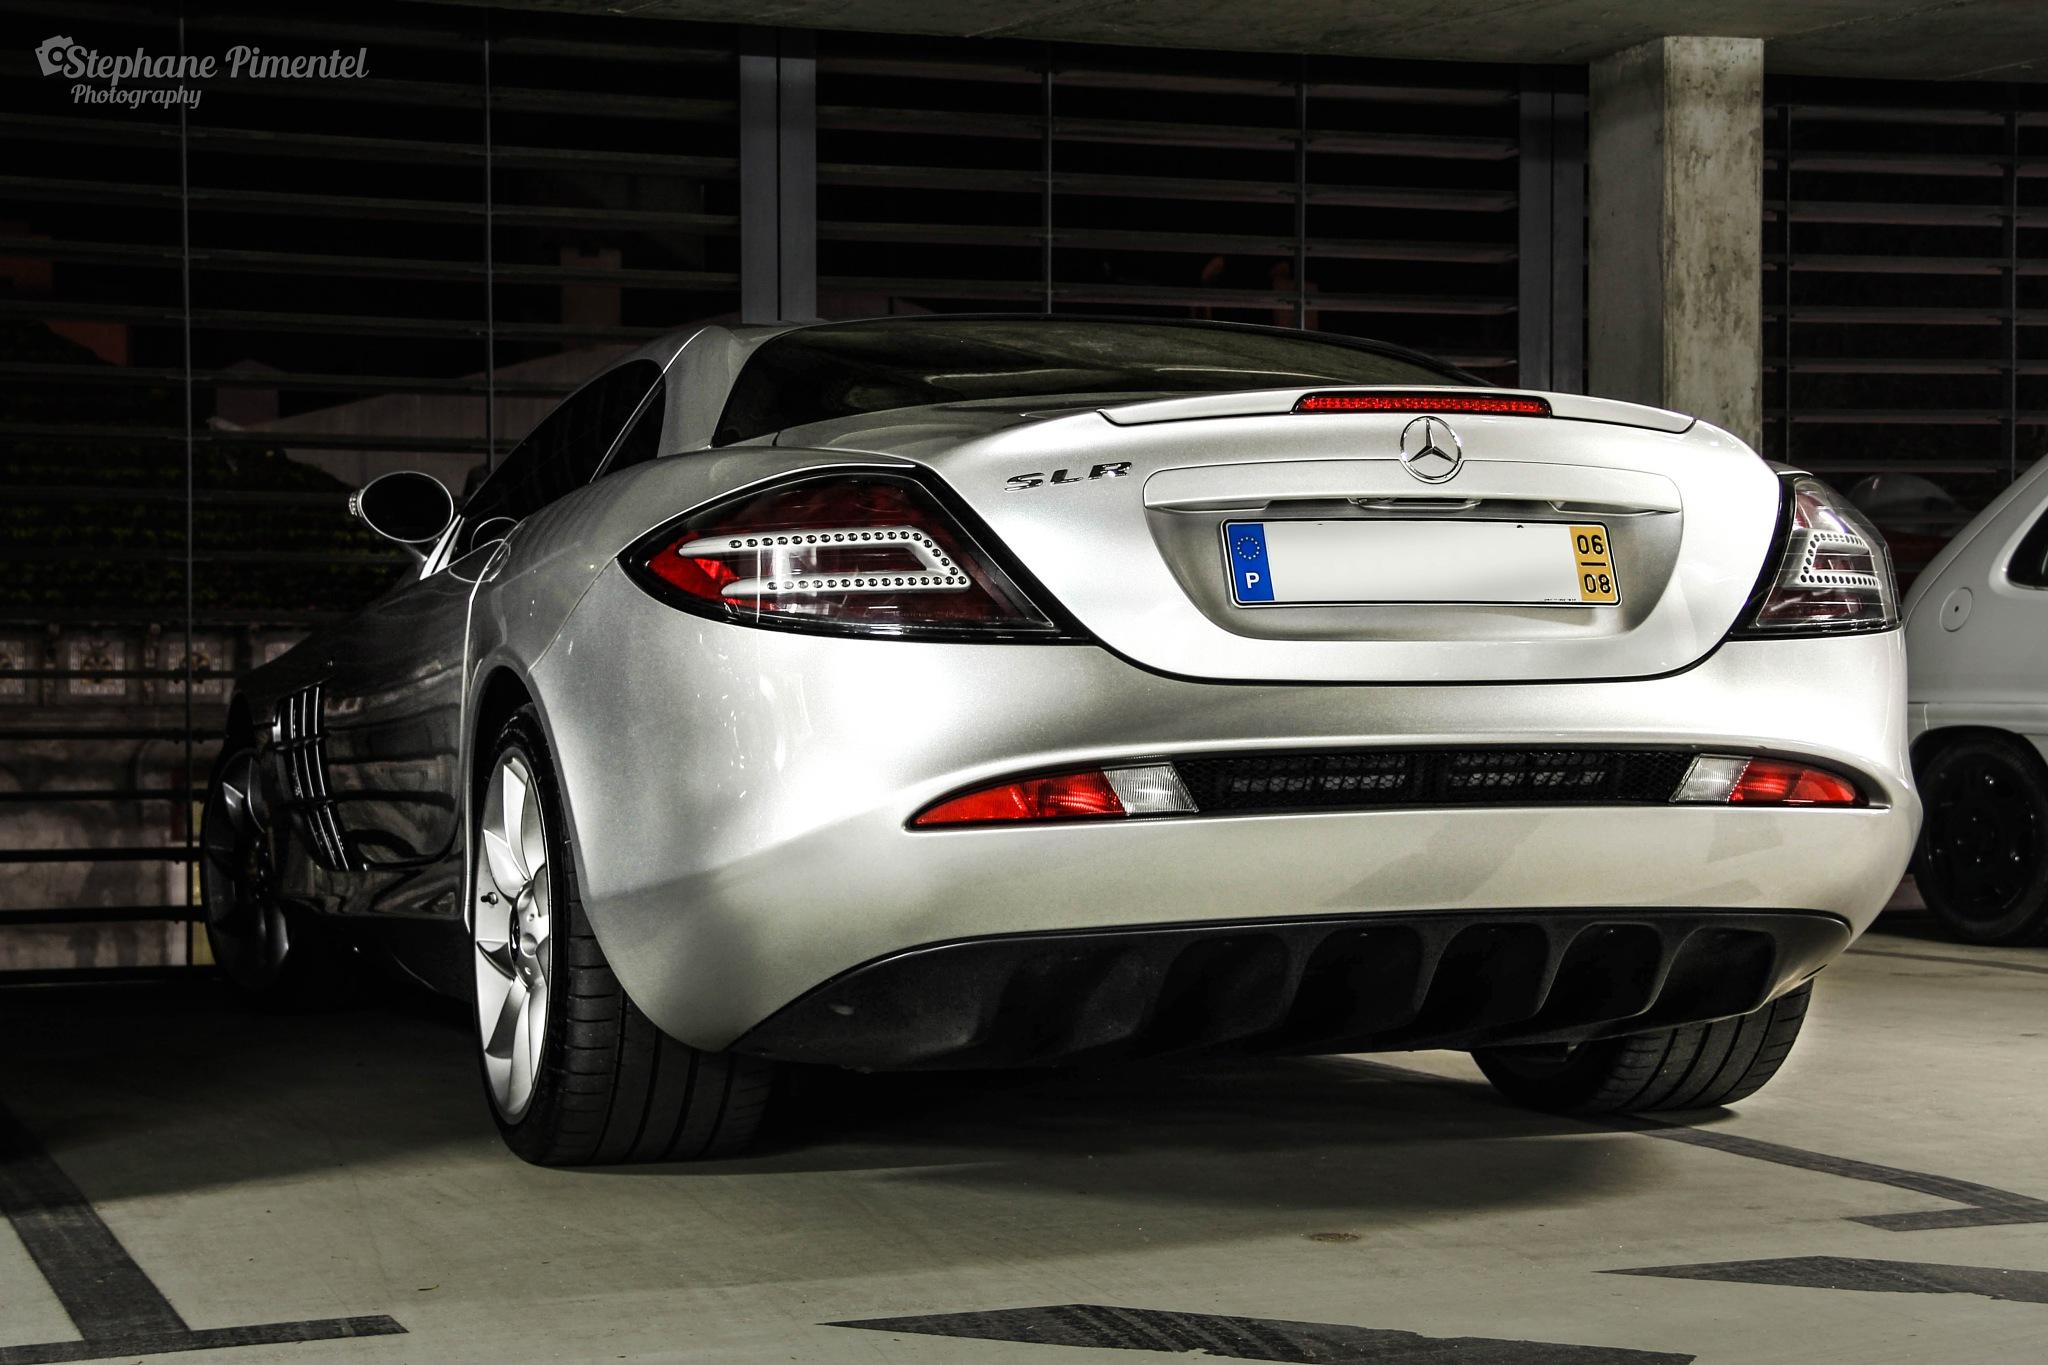 Mercedes-Benz SLR McLaren  by Stephane Pimentel Photography